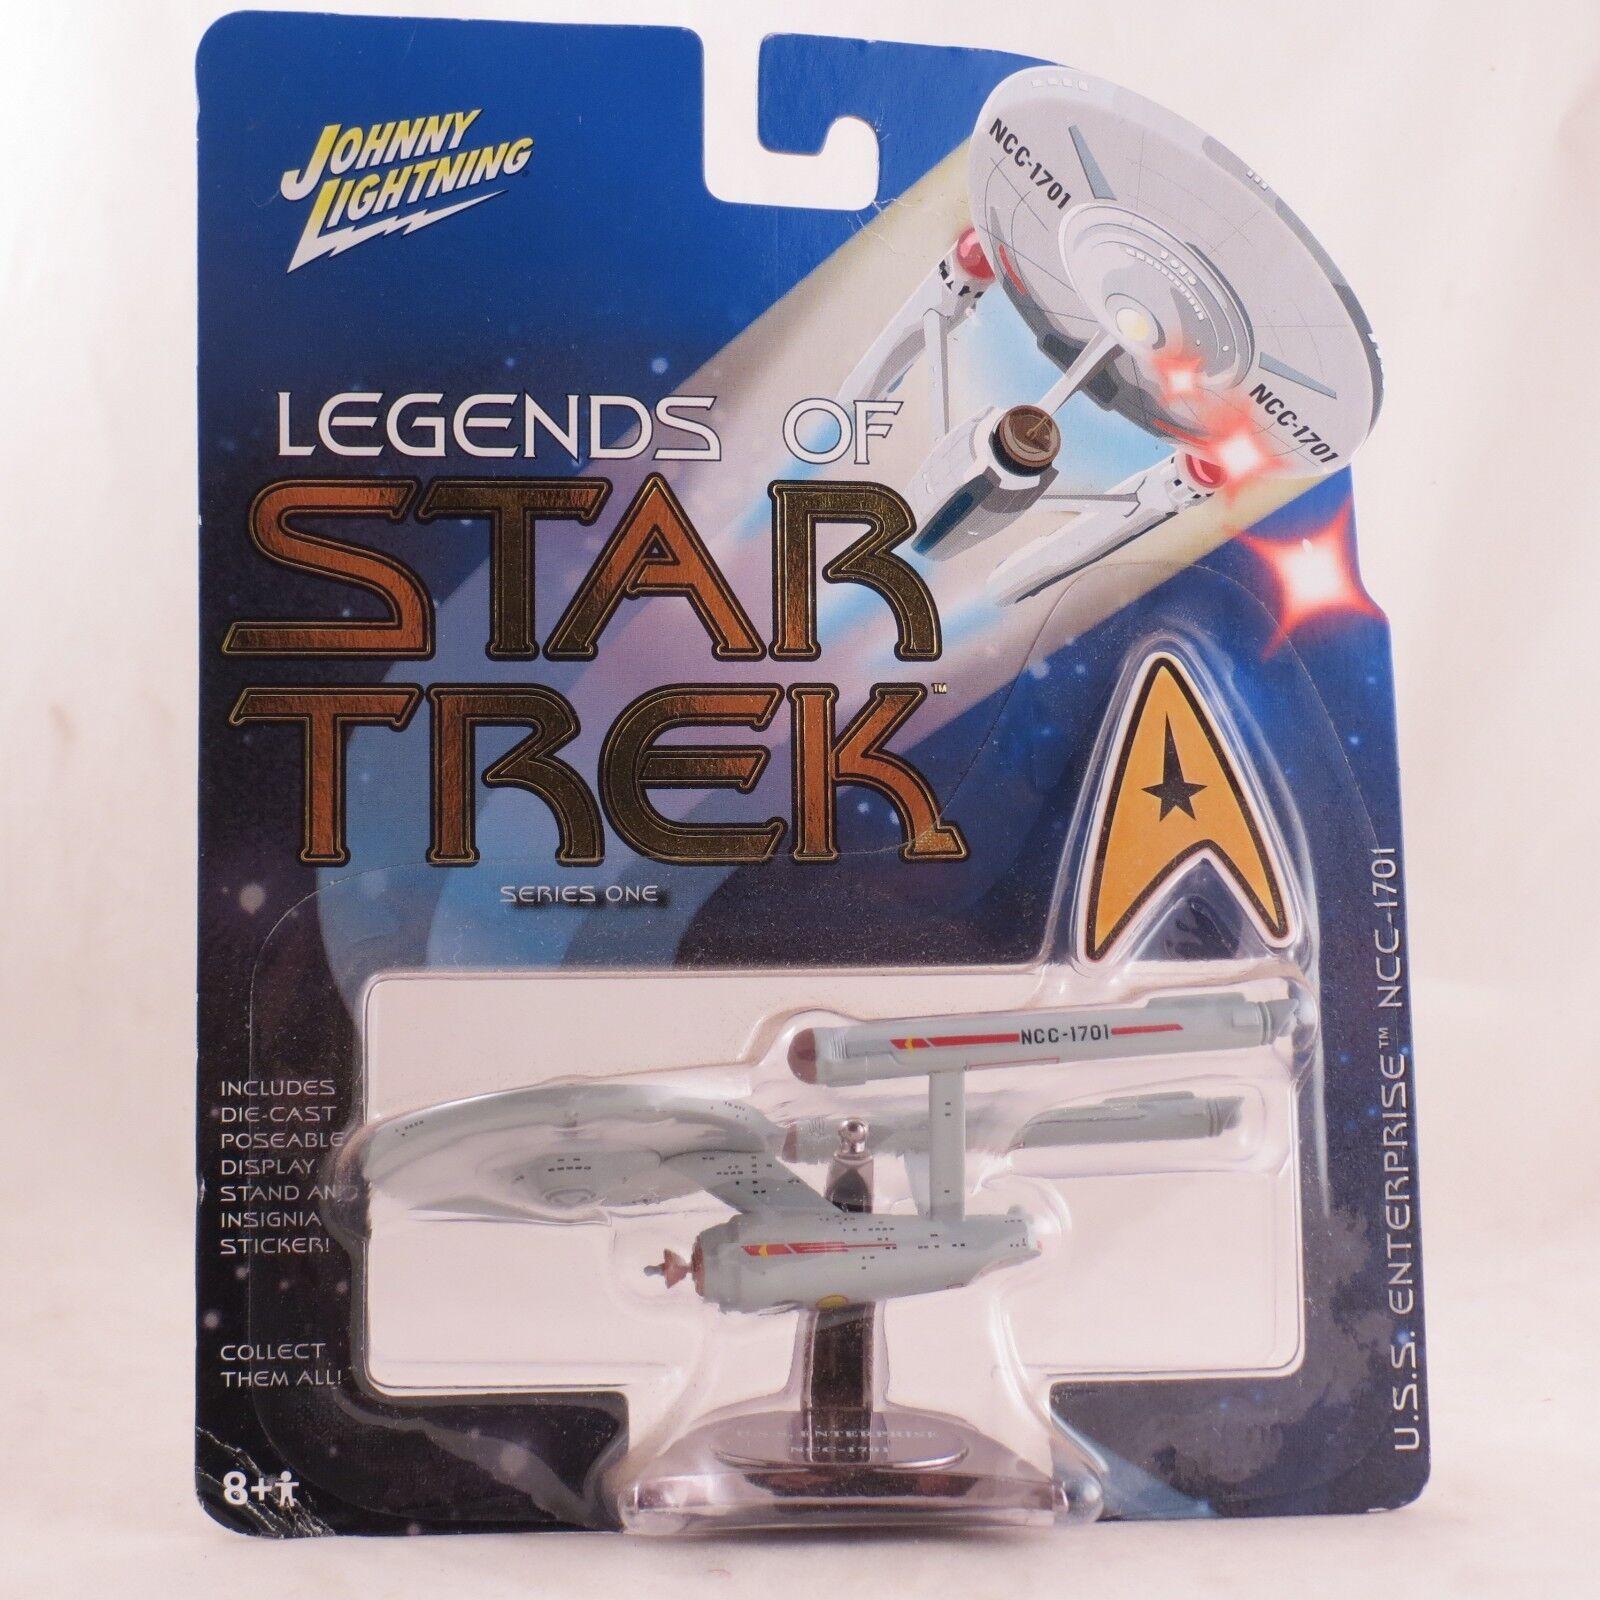 Star Trek Legends USS Enterprise NCC-1701 series 1 by Johnny Lightning